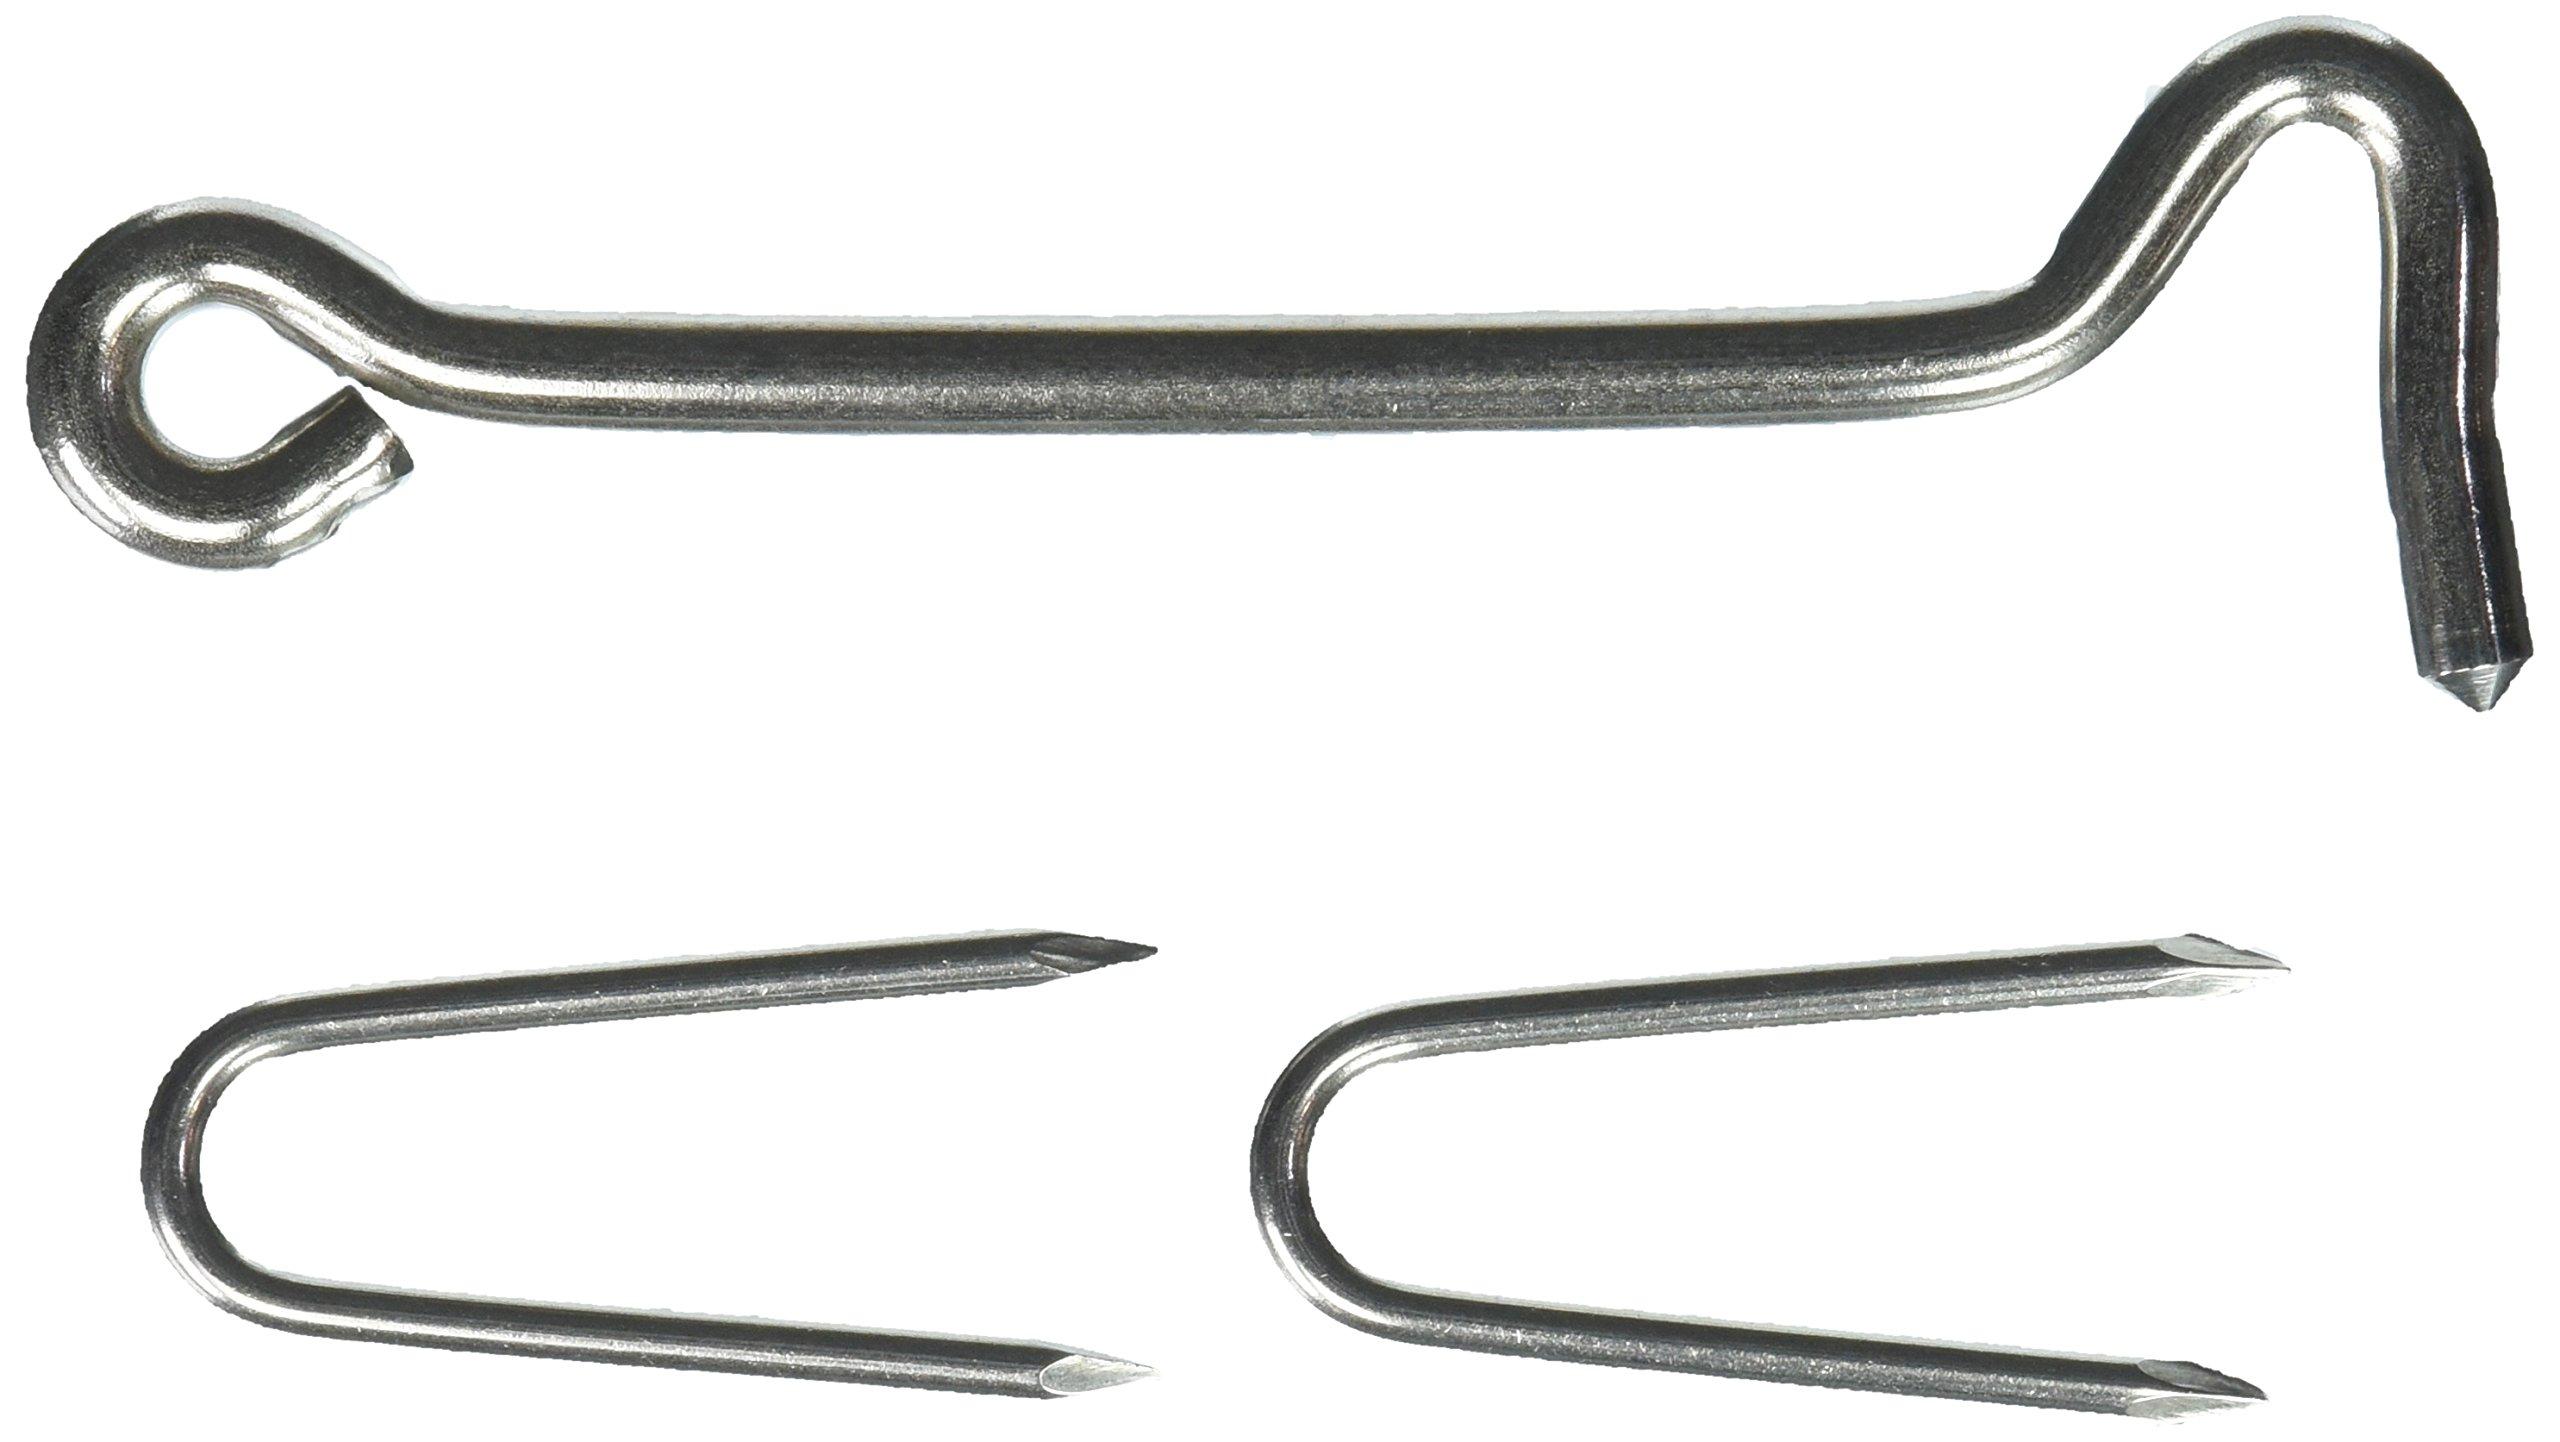 MINTCRAFT LR-431S Staple Plates/Hooks, 6-Inch, Stainless Steel